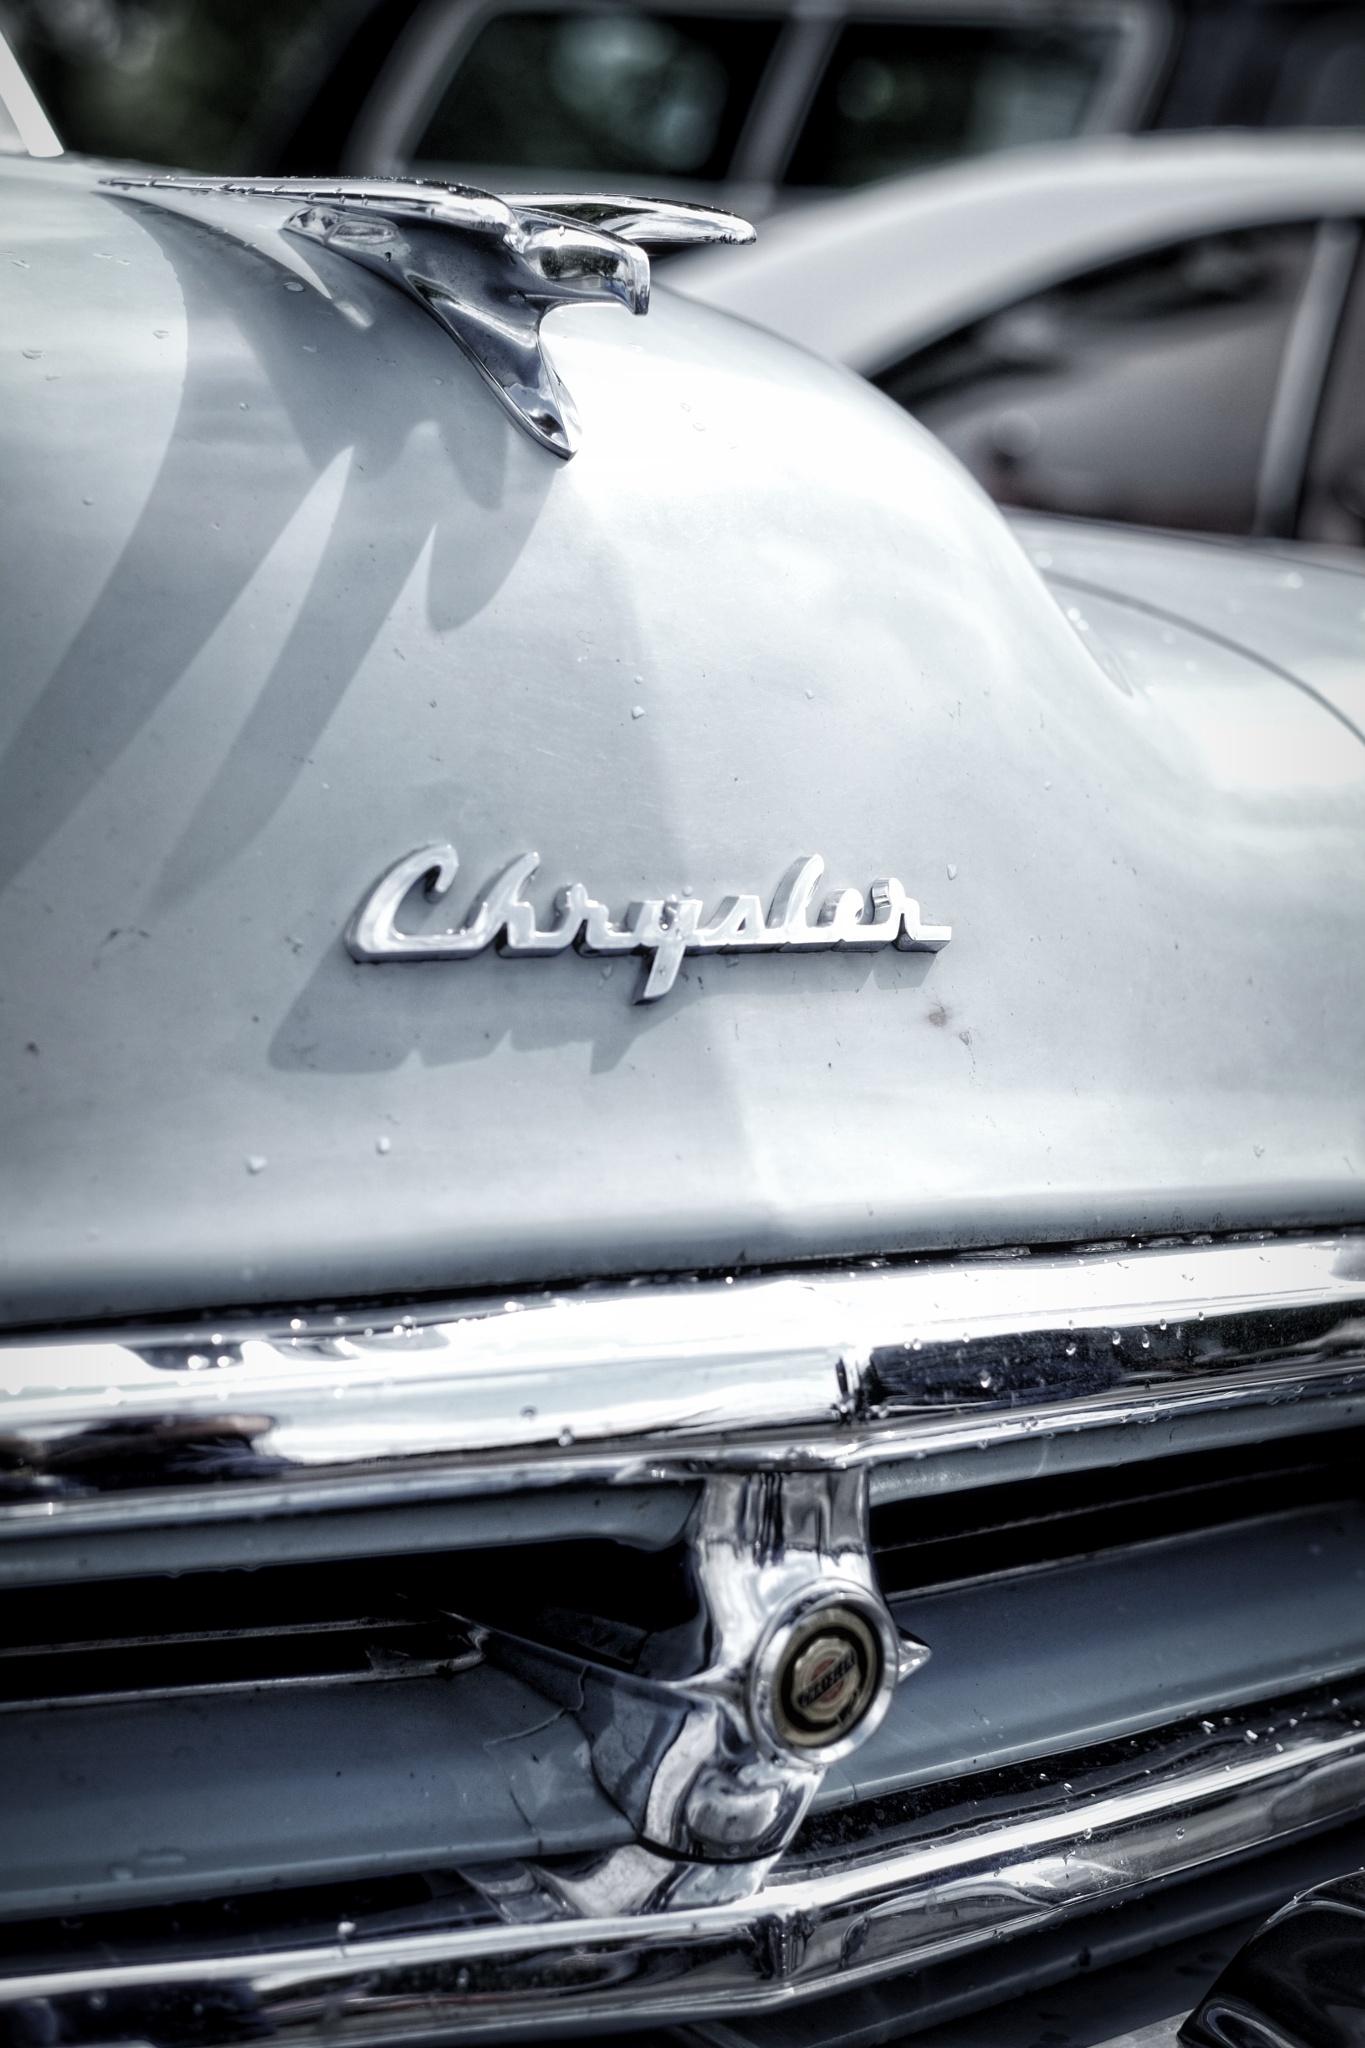 Chrysler by peterkryzun